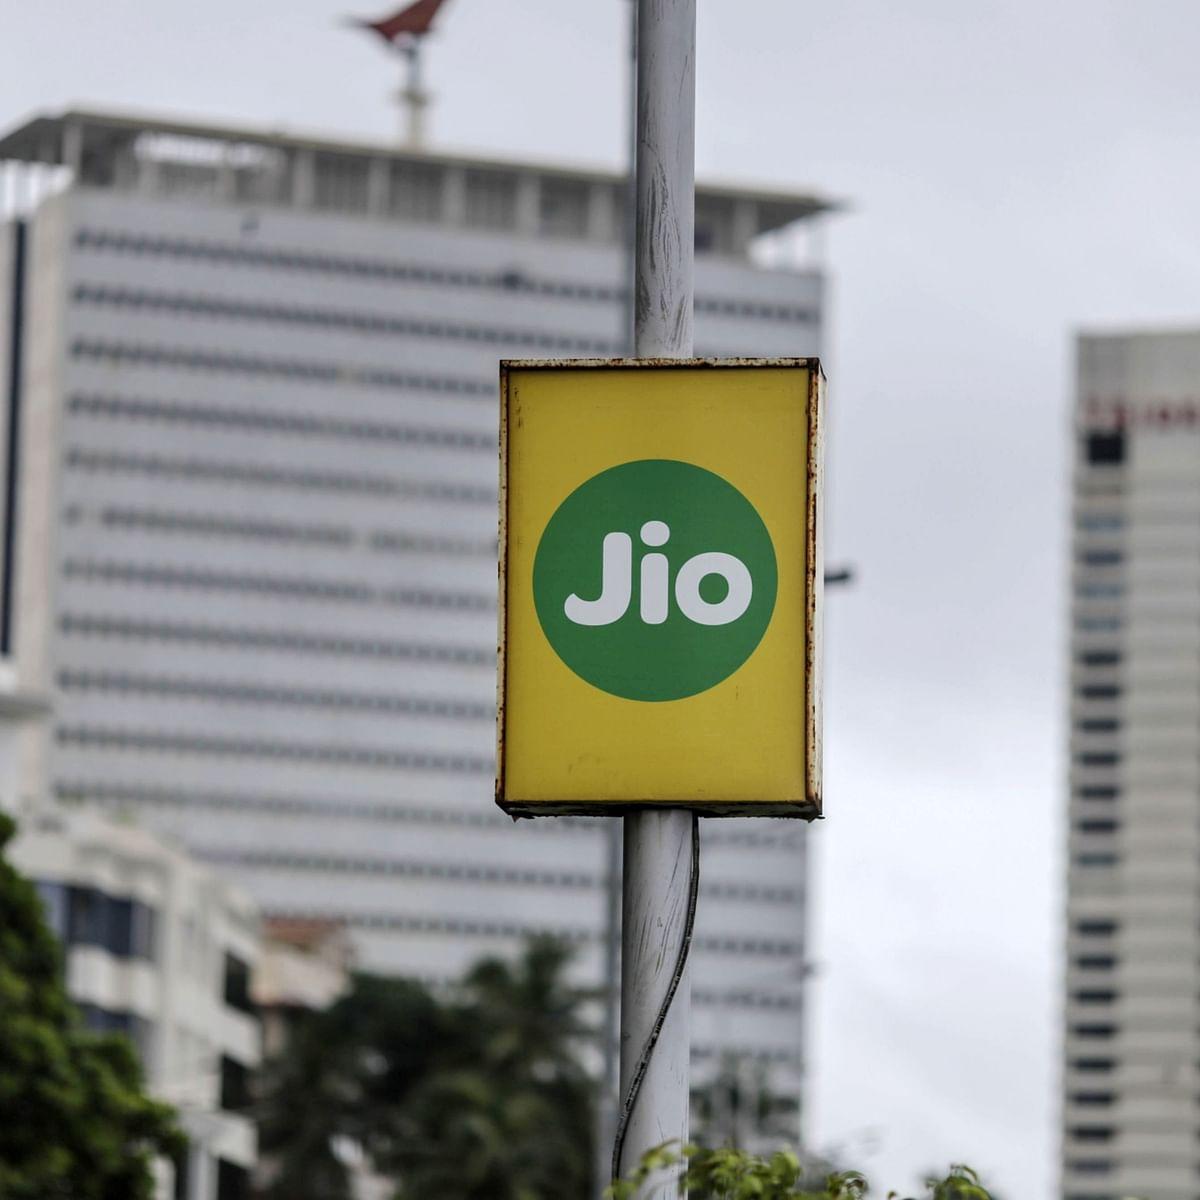 Reliance Jio's Q2 Profit Rises 13% On A Bigger Subscriber Base